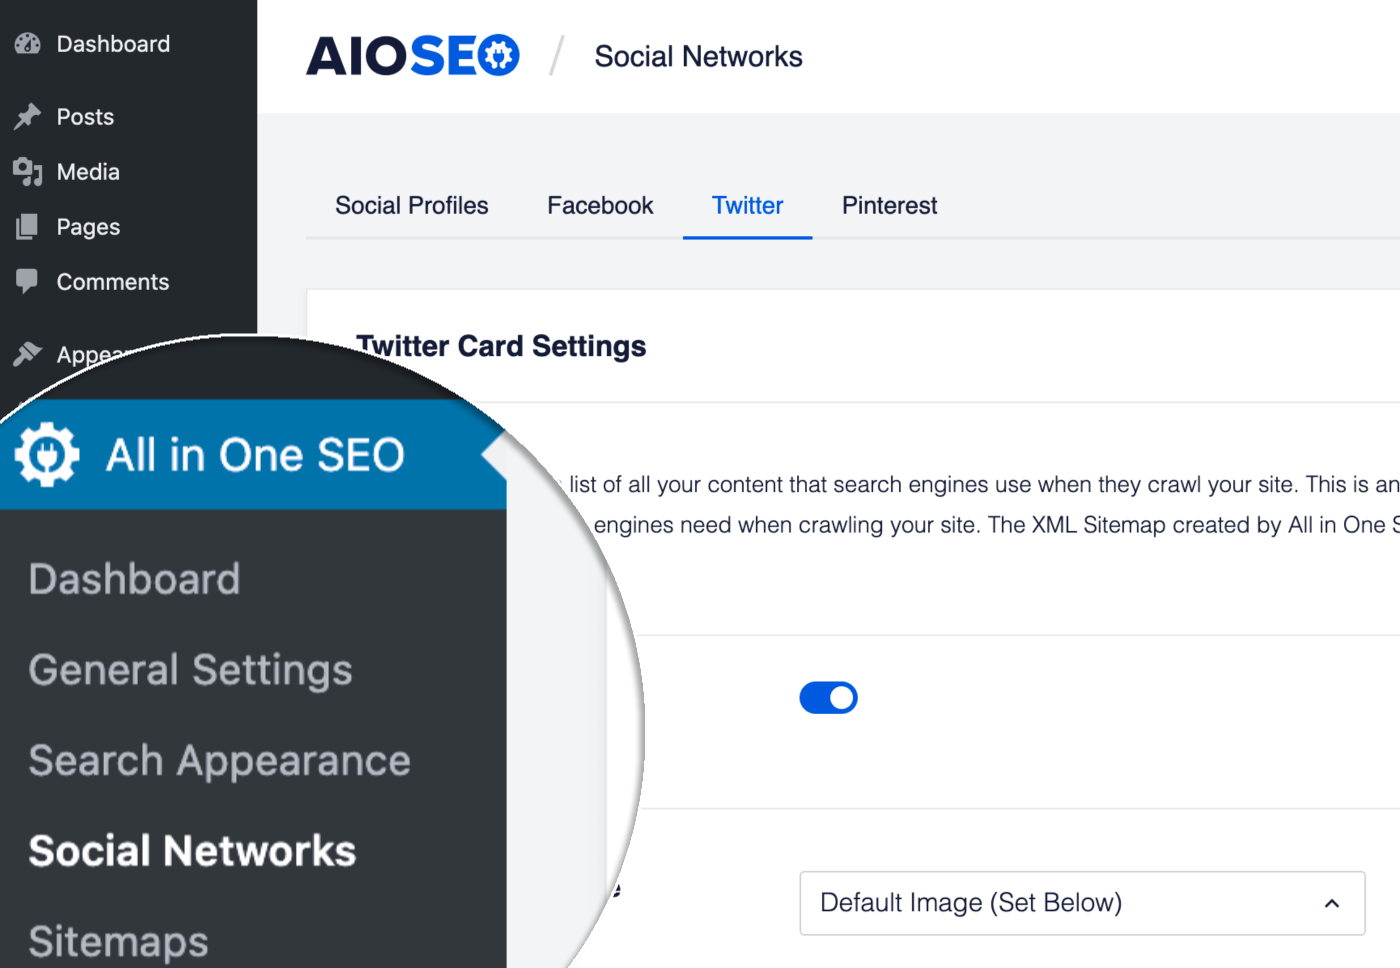 Social Networks menu item in the All in One SEO menu